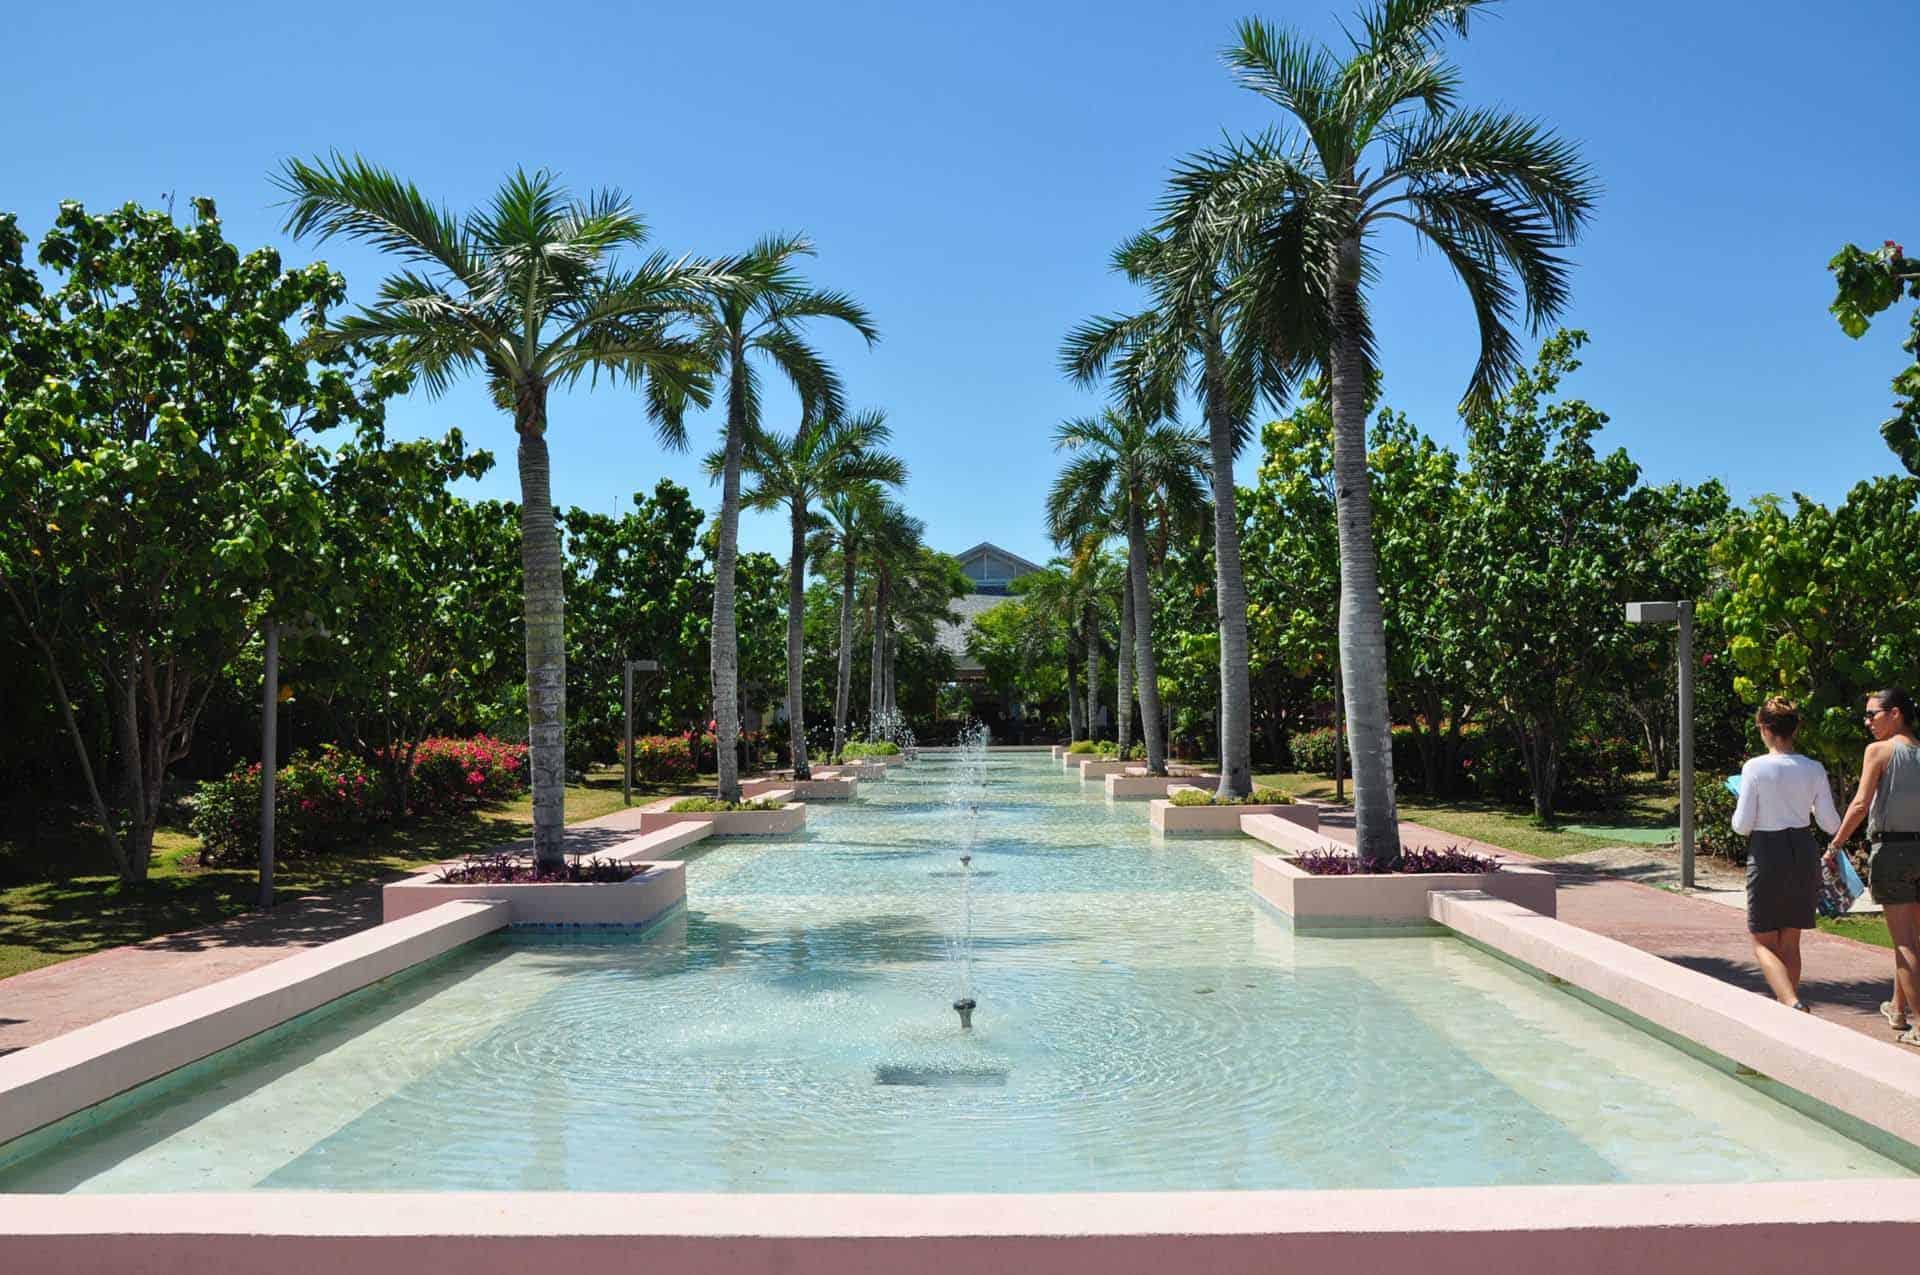 cayo santa maria hotel piscine palmiers cuba autrement 1